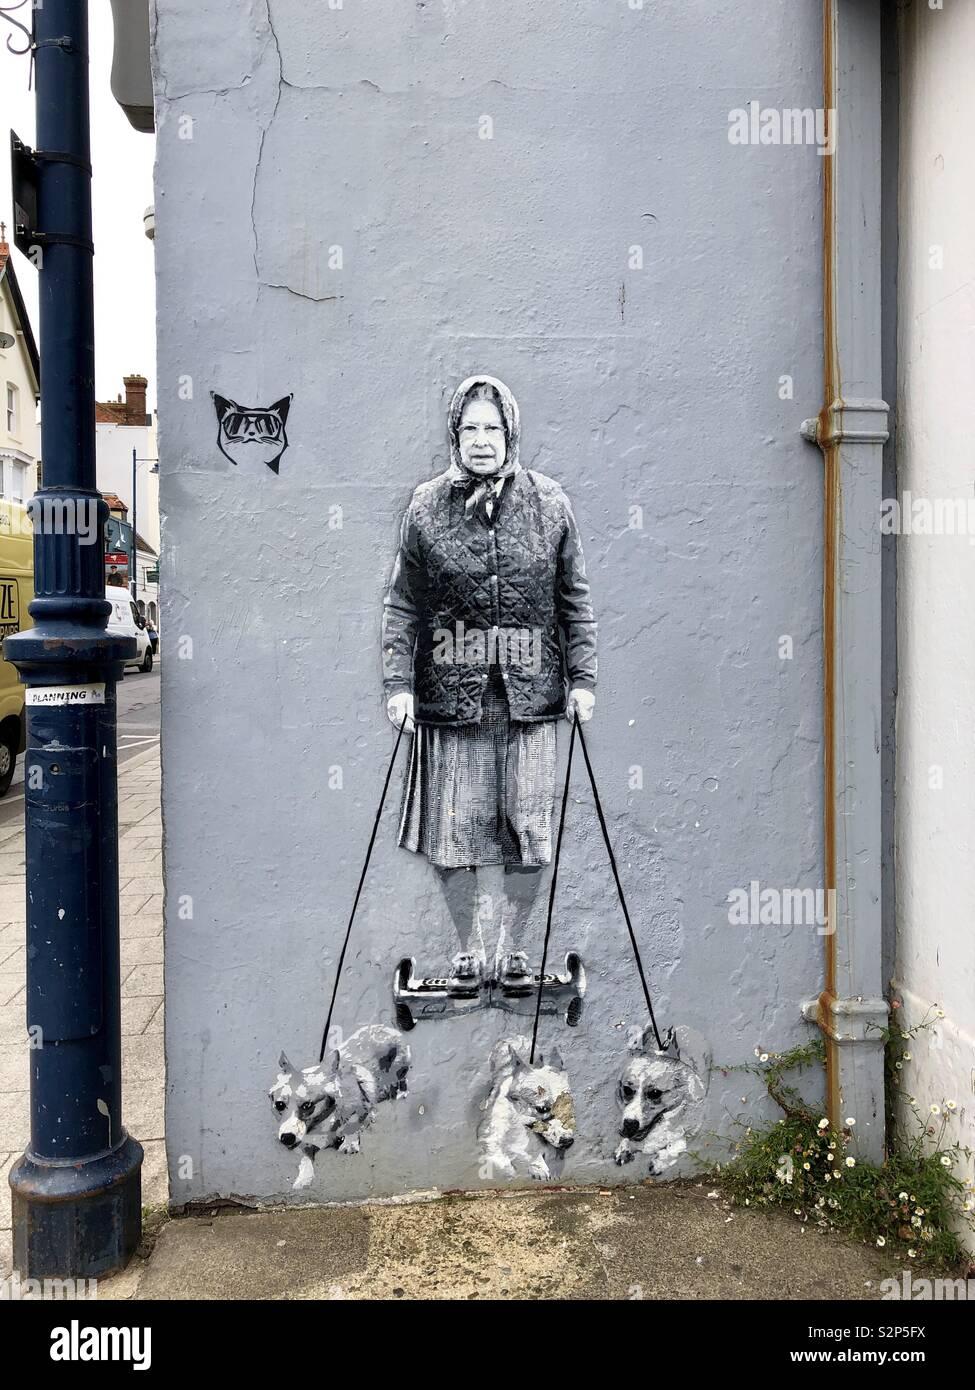 Catman graffiti-Reina y corgis Foto de stock